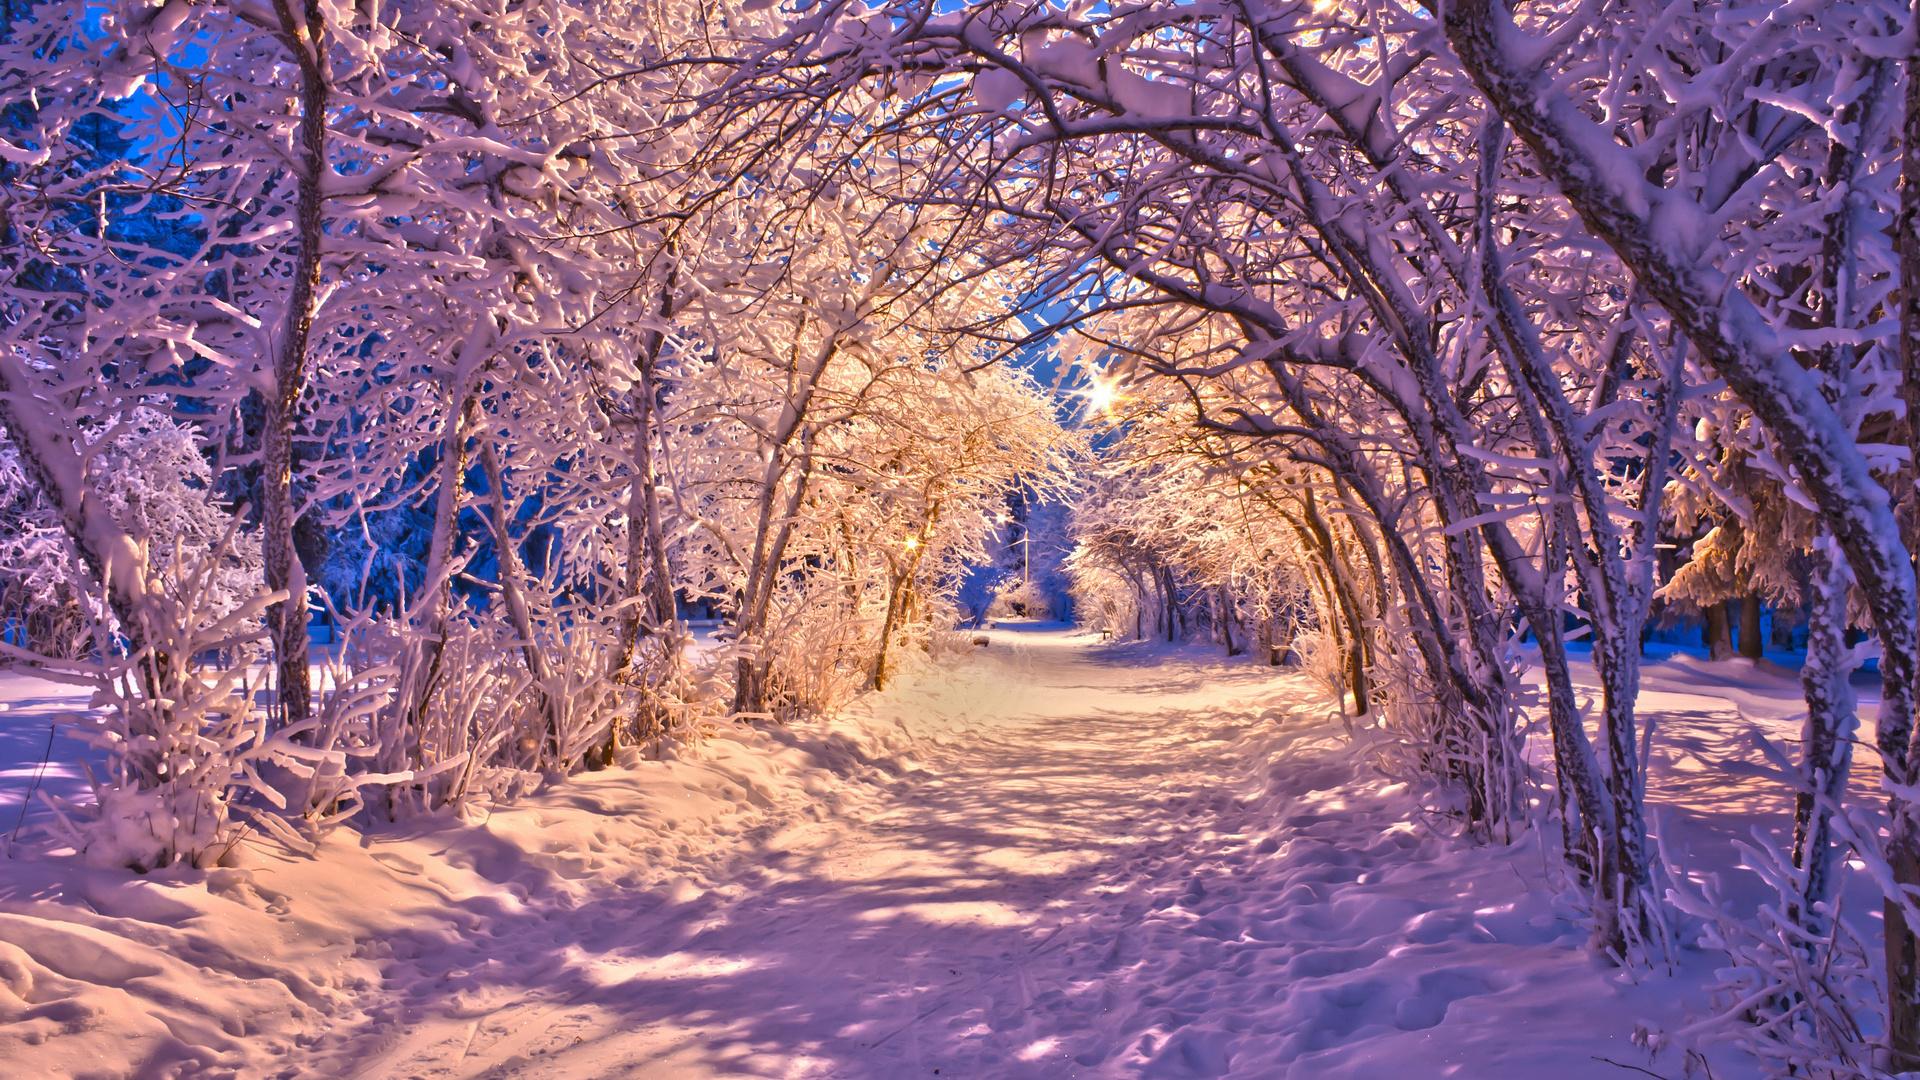 Winter Snow Christmas Sidewalk Roads Lights White Trees Wallpaper 1920x1080